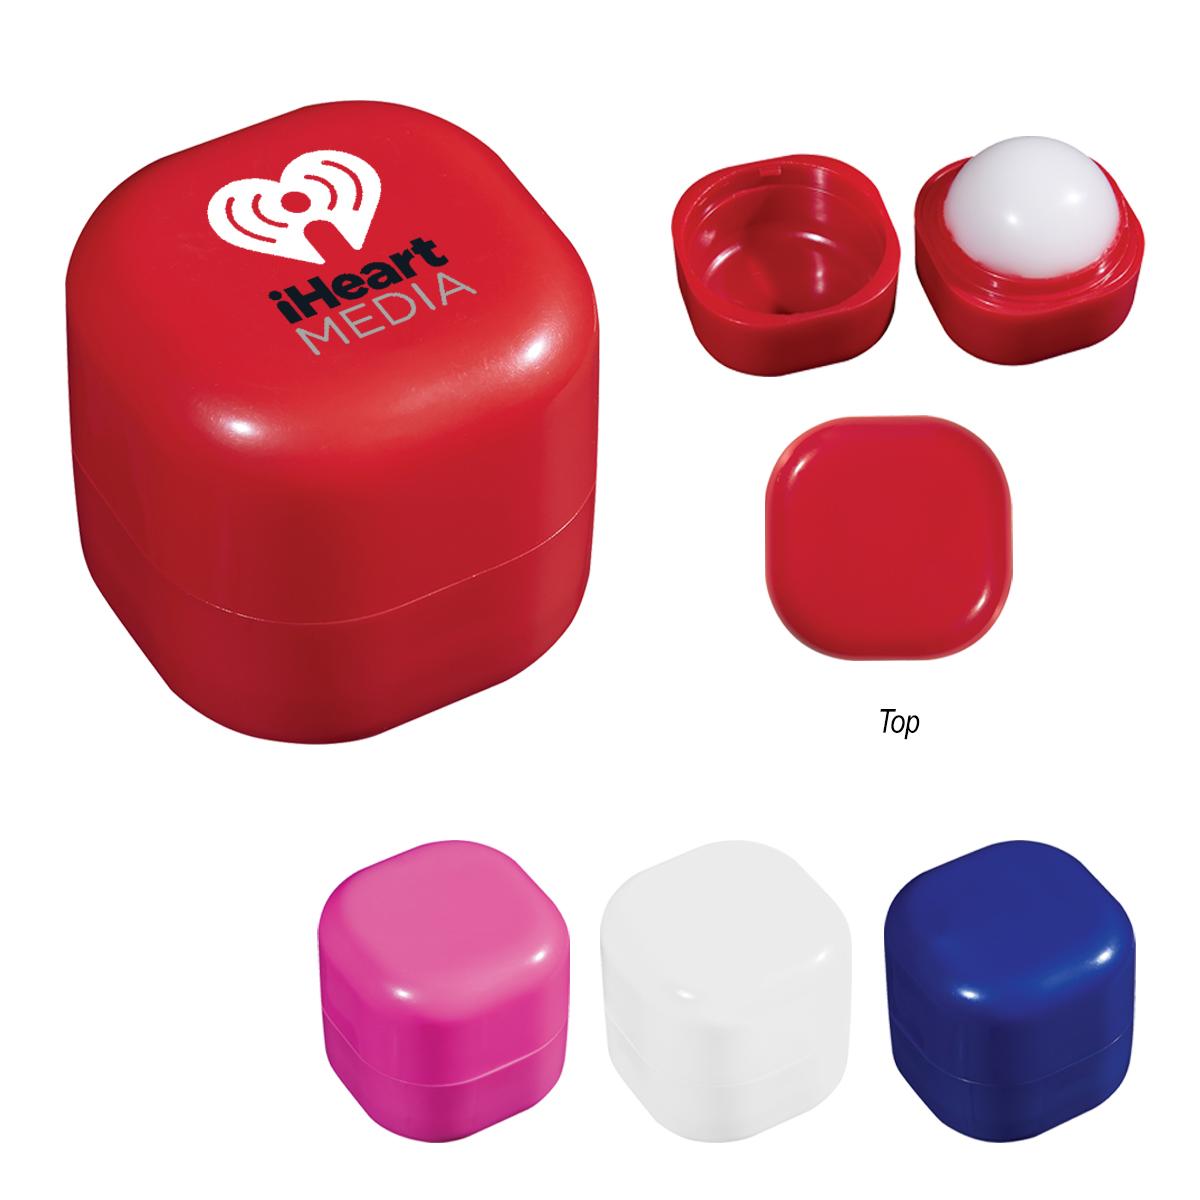 395929679-816 - Lip Moisturizer Cube - thumbnail